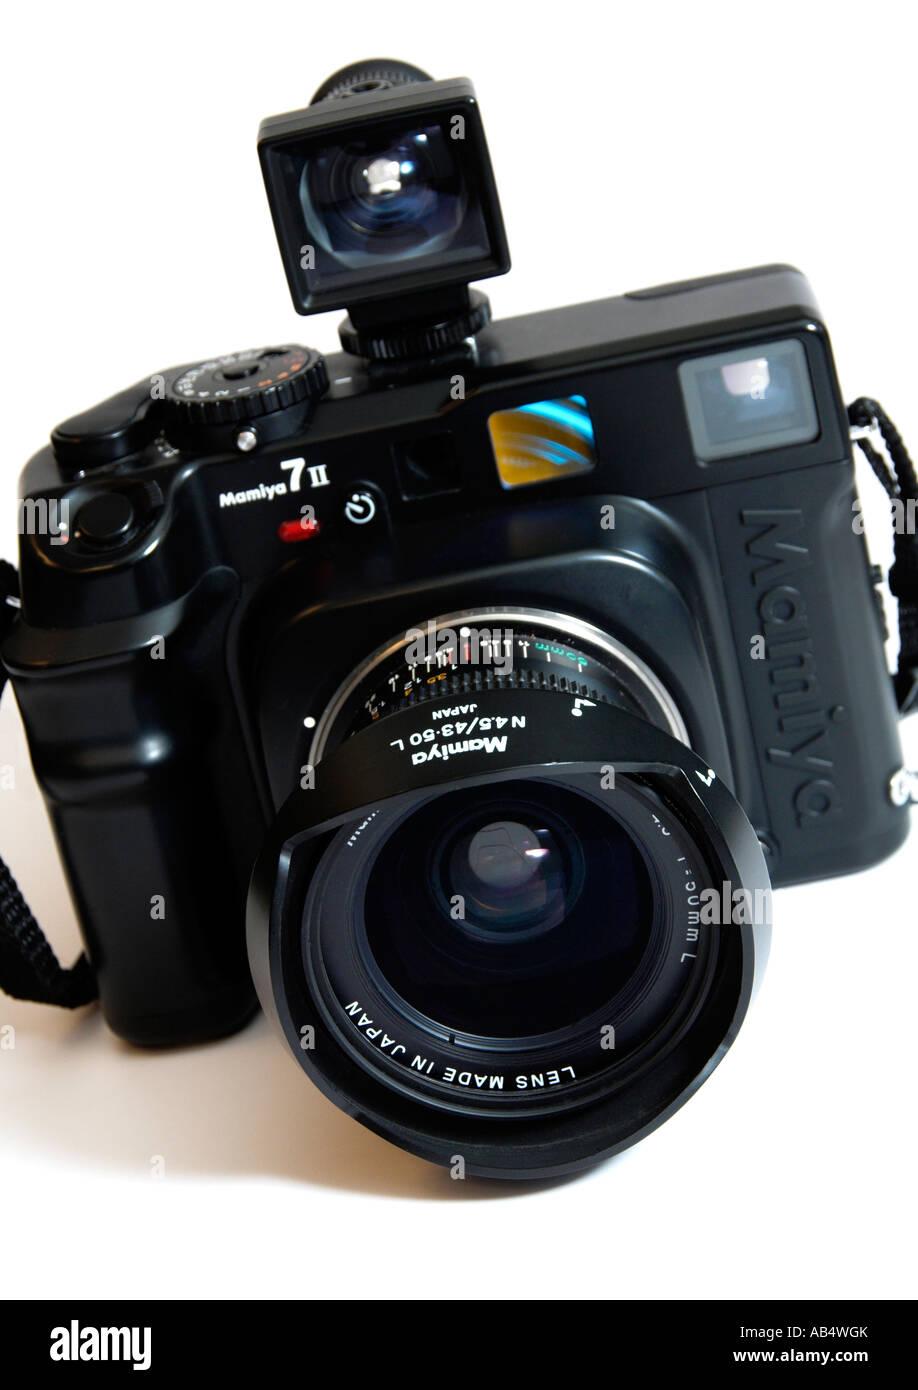 Mamiya 7 Rangefinder Camera  FOR EDITORIAL USE ONLY - Stock Image